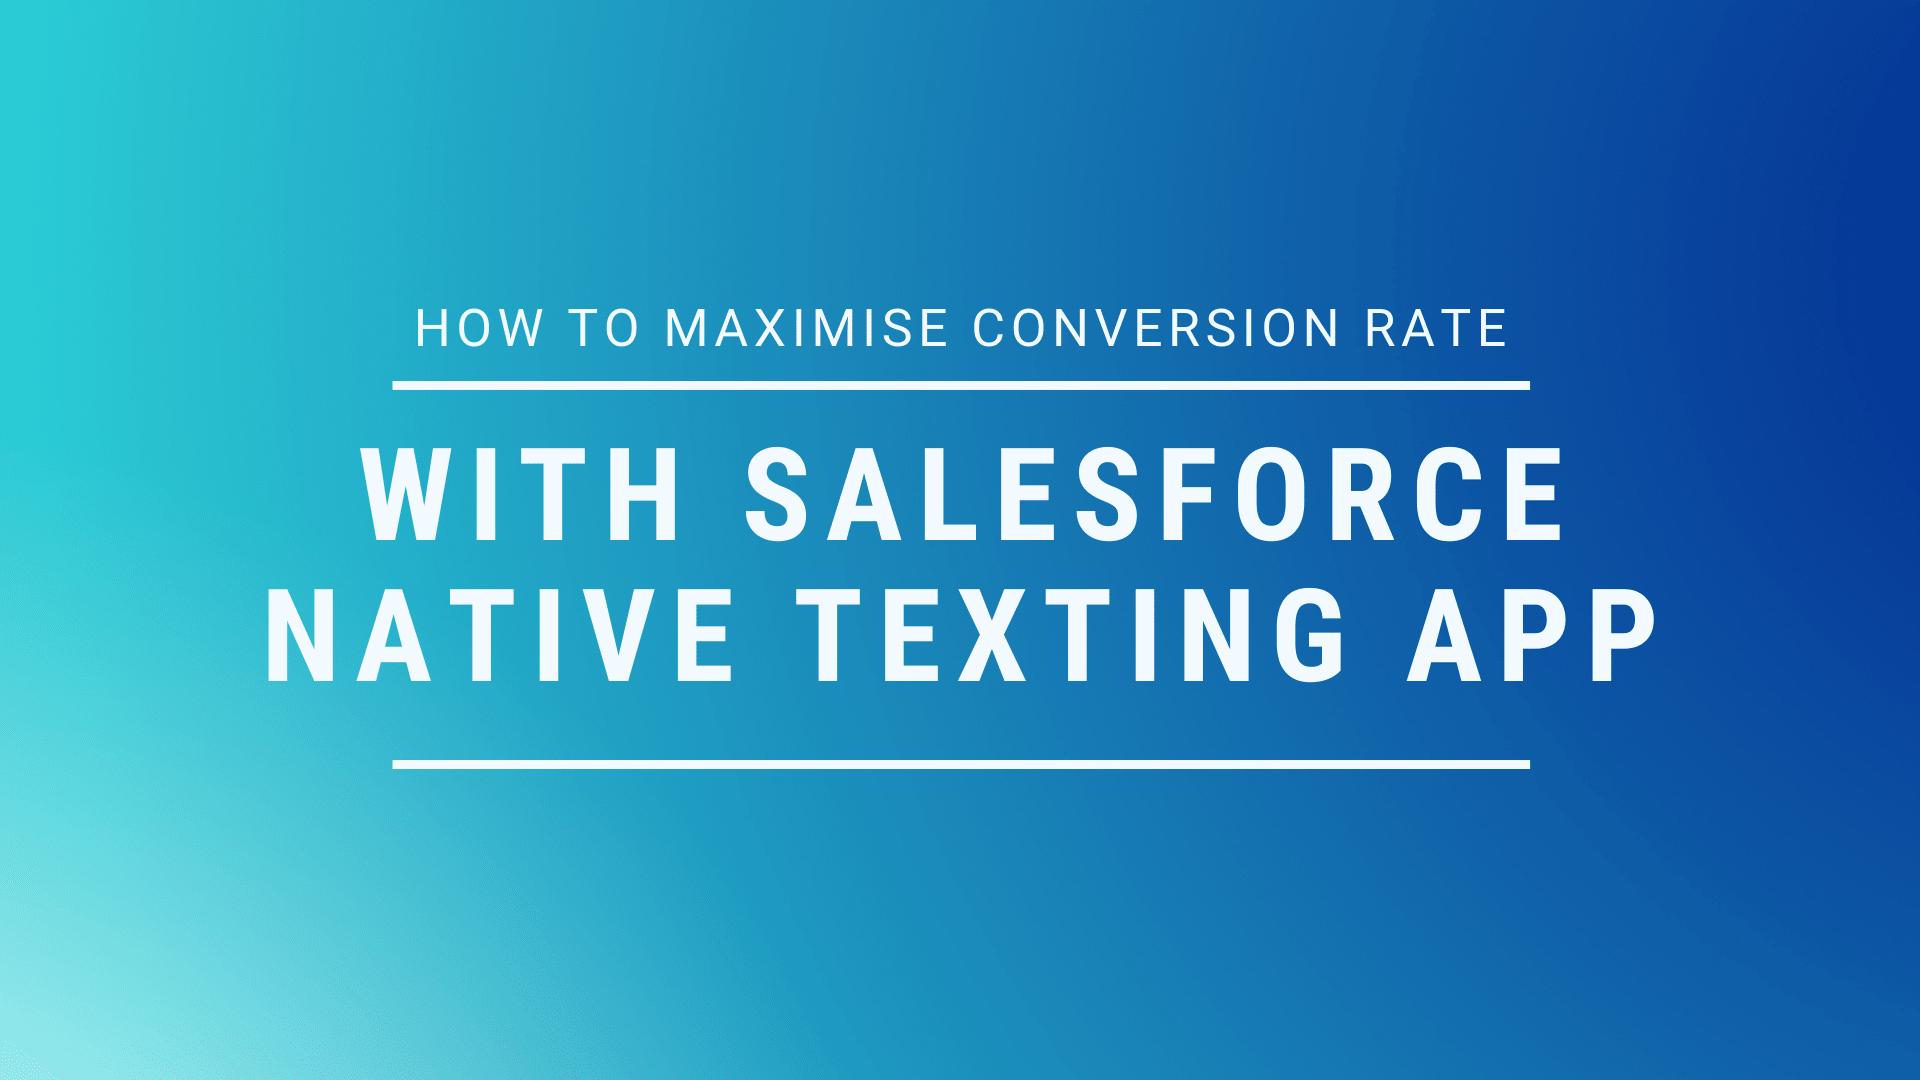 Salesforce native texting App